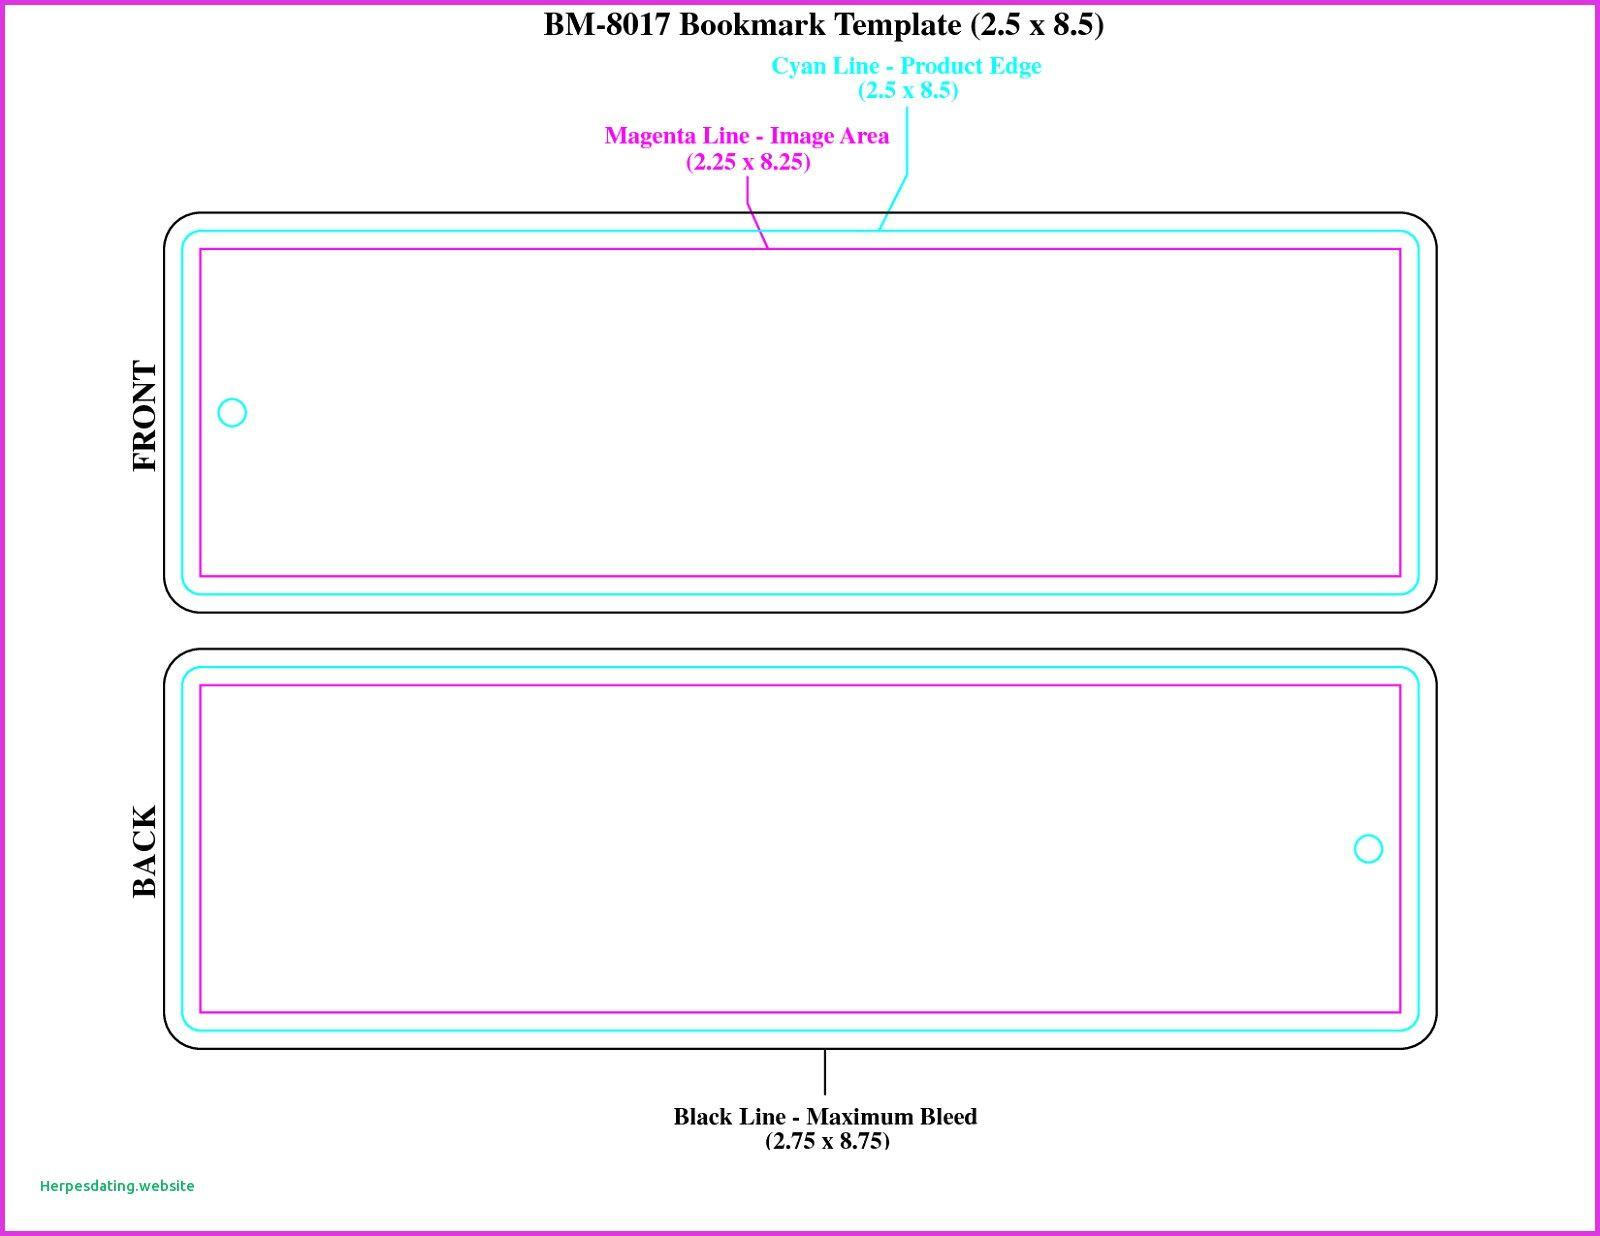 Free Blank Bookmark Templates To Print Elegant Wonderful Bible Template Inspirati Bookmark Template Free Printable Bookmarks Templates Free Printable Bookmarks